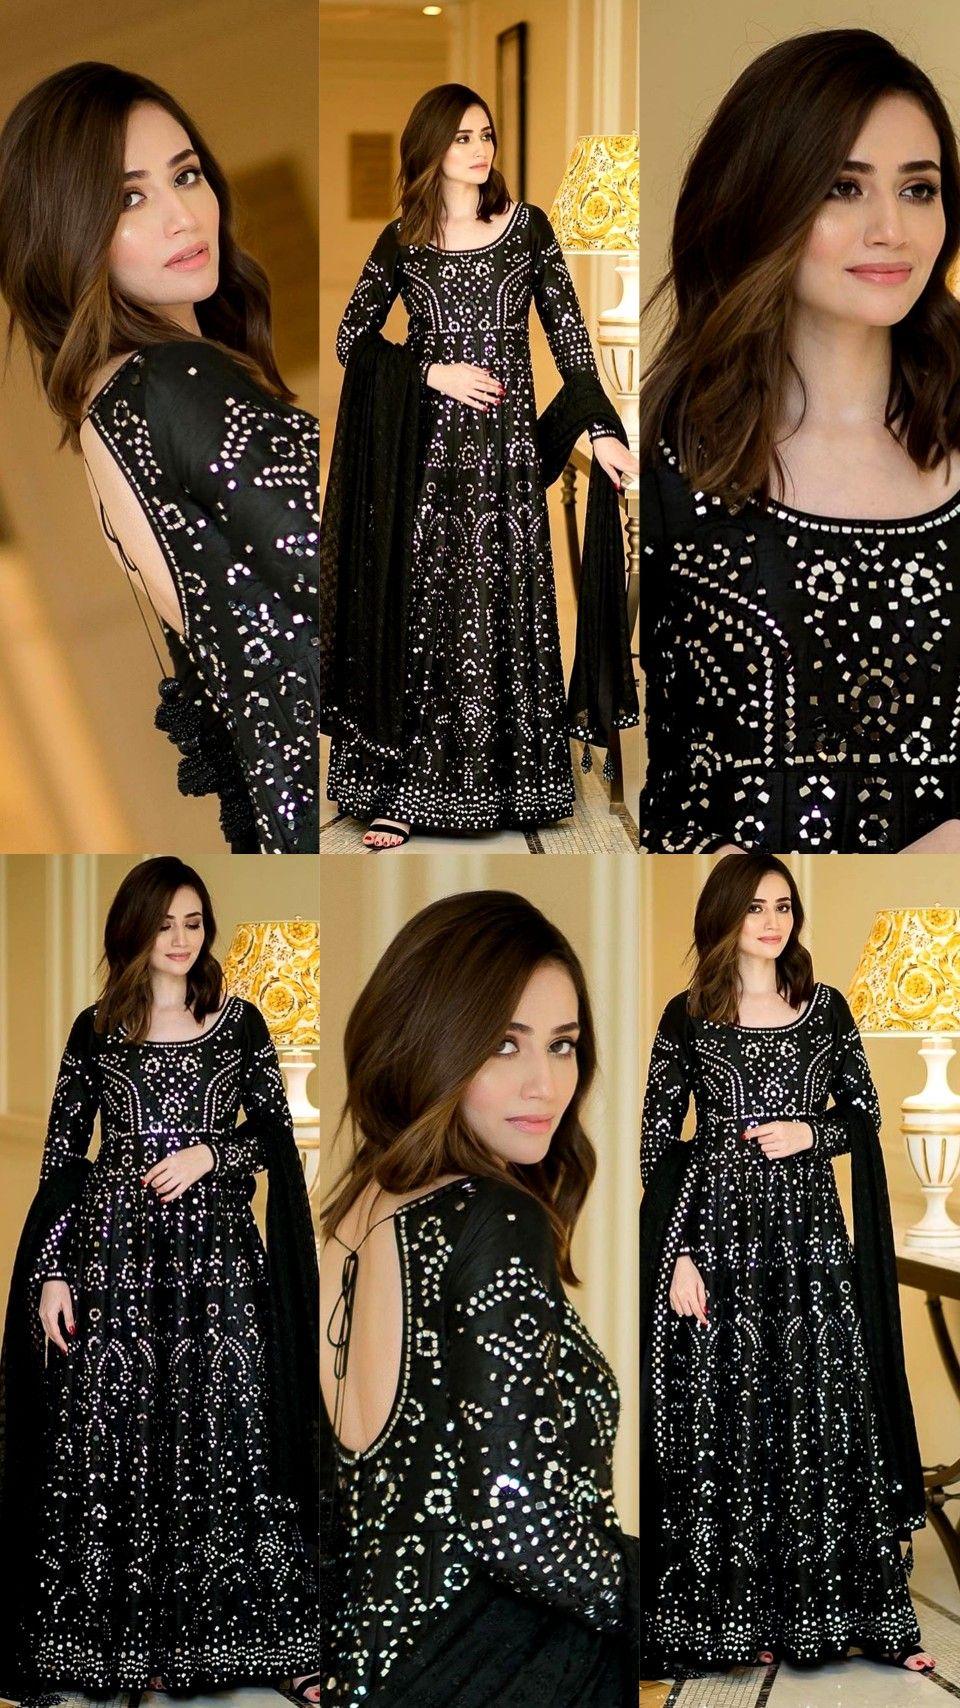 Pin By Zai Noor On Sana Javed Guriya In 2020 Stylish Party Dresses Girls Fashion Clothes Stylish Short Dresses